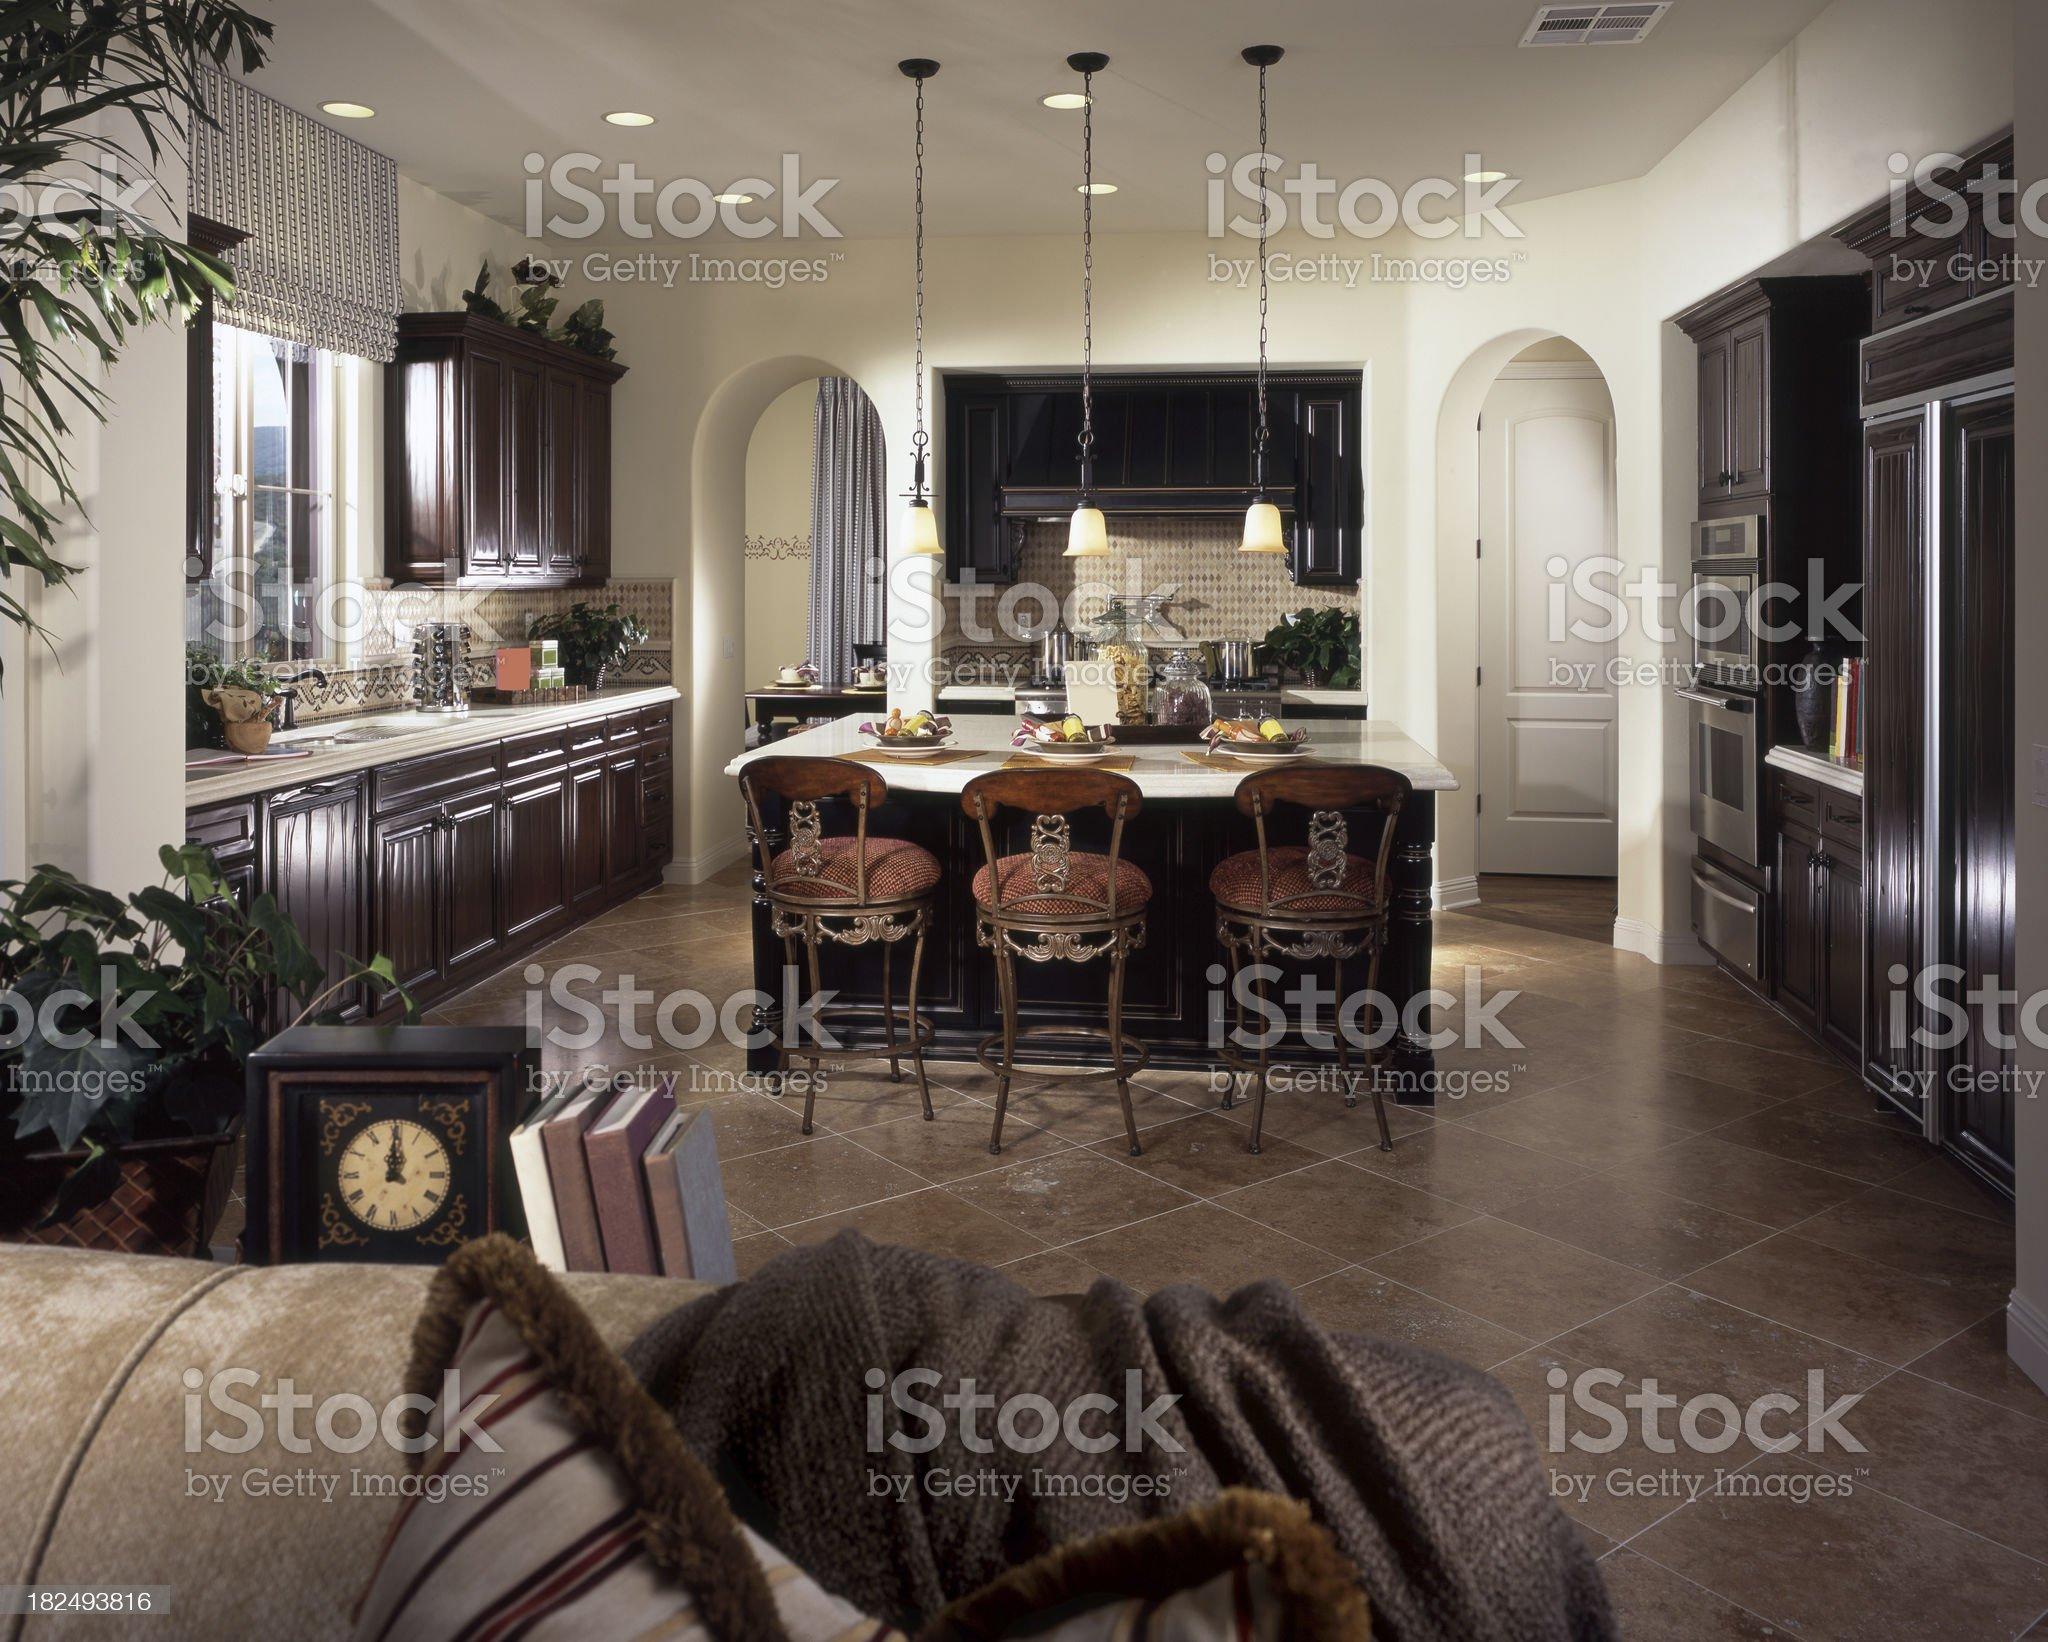 Kitchen Design Home Interior royalty-free stock photo